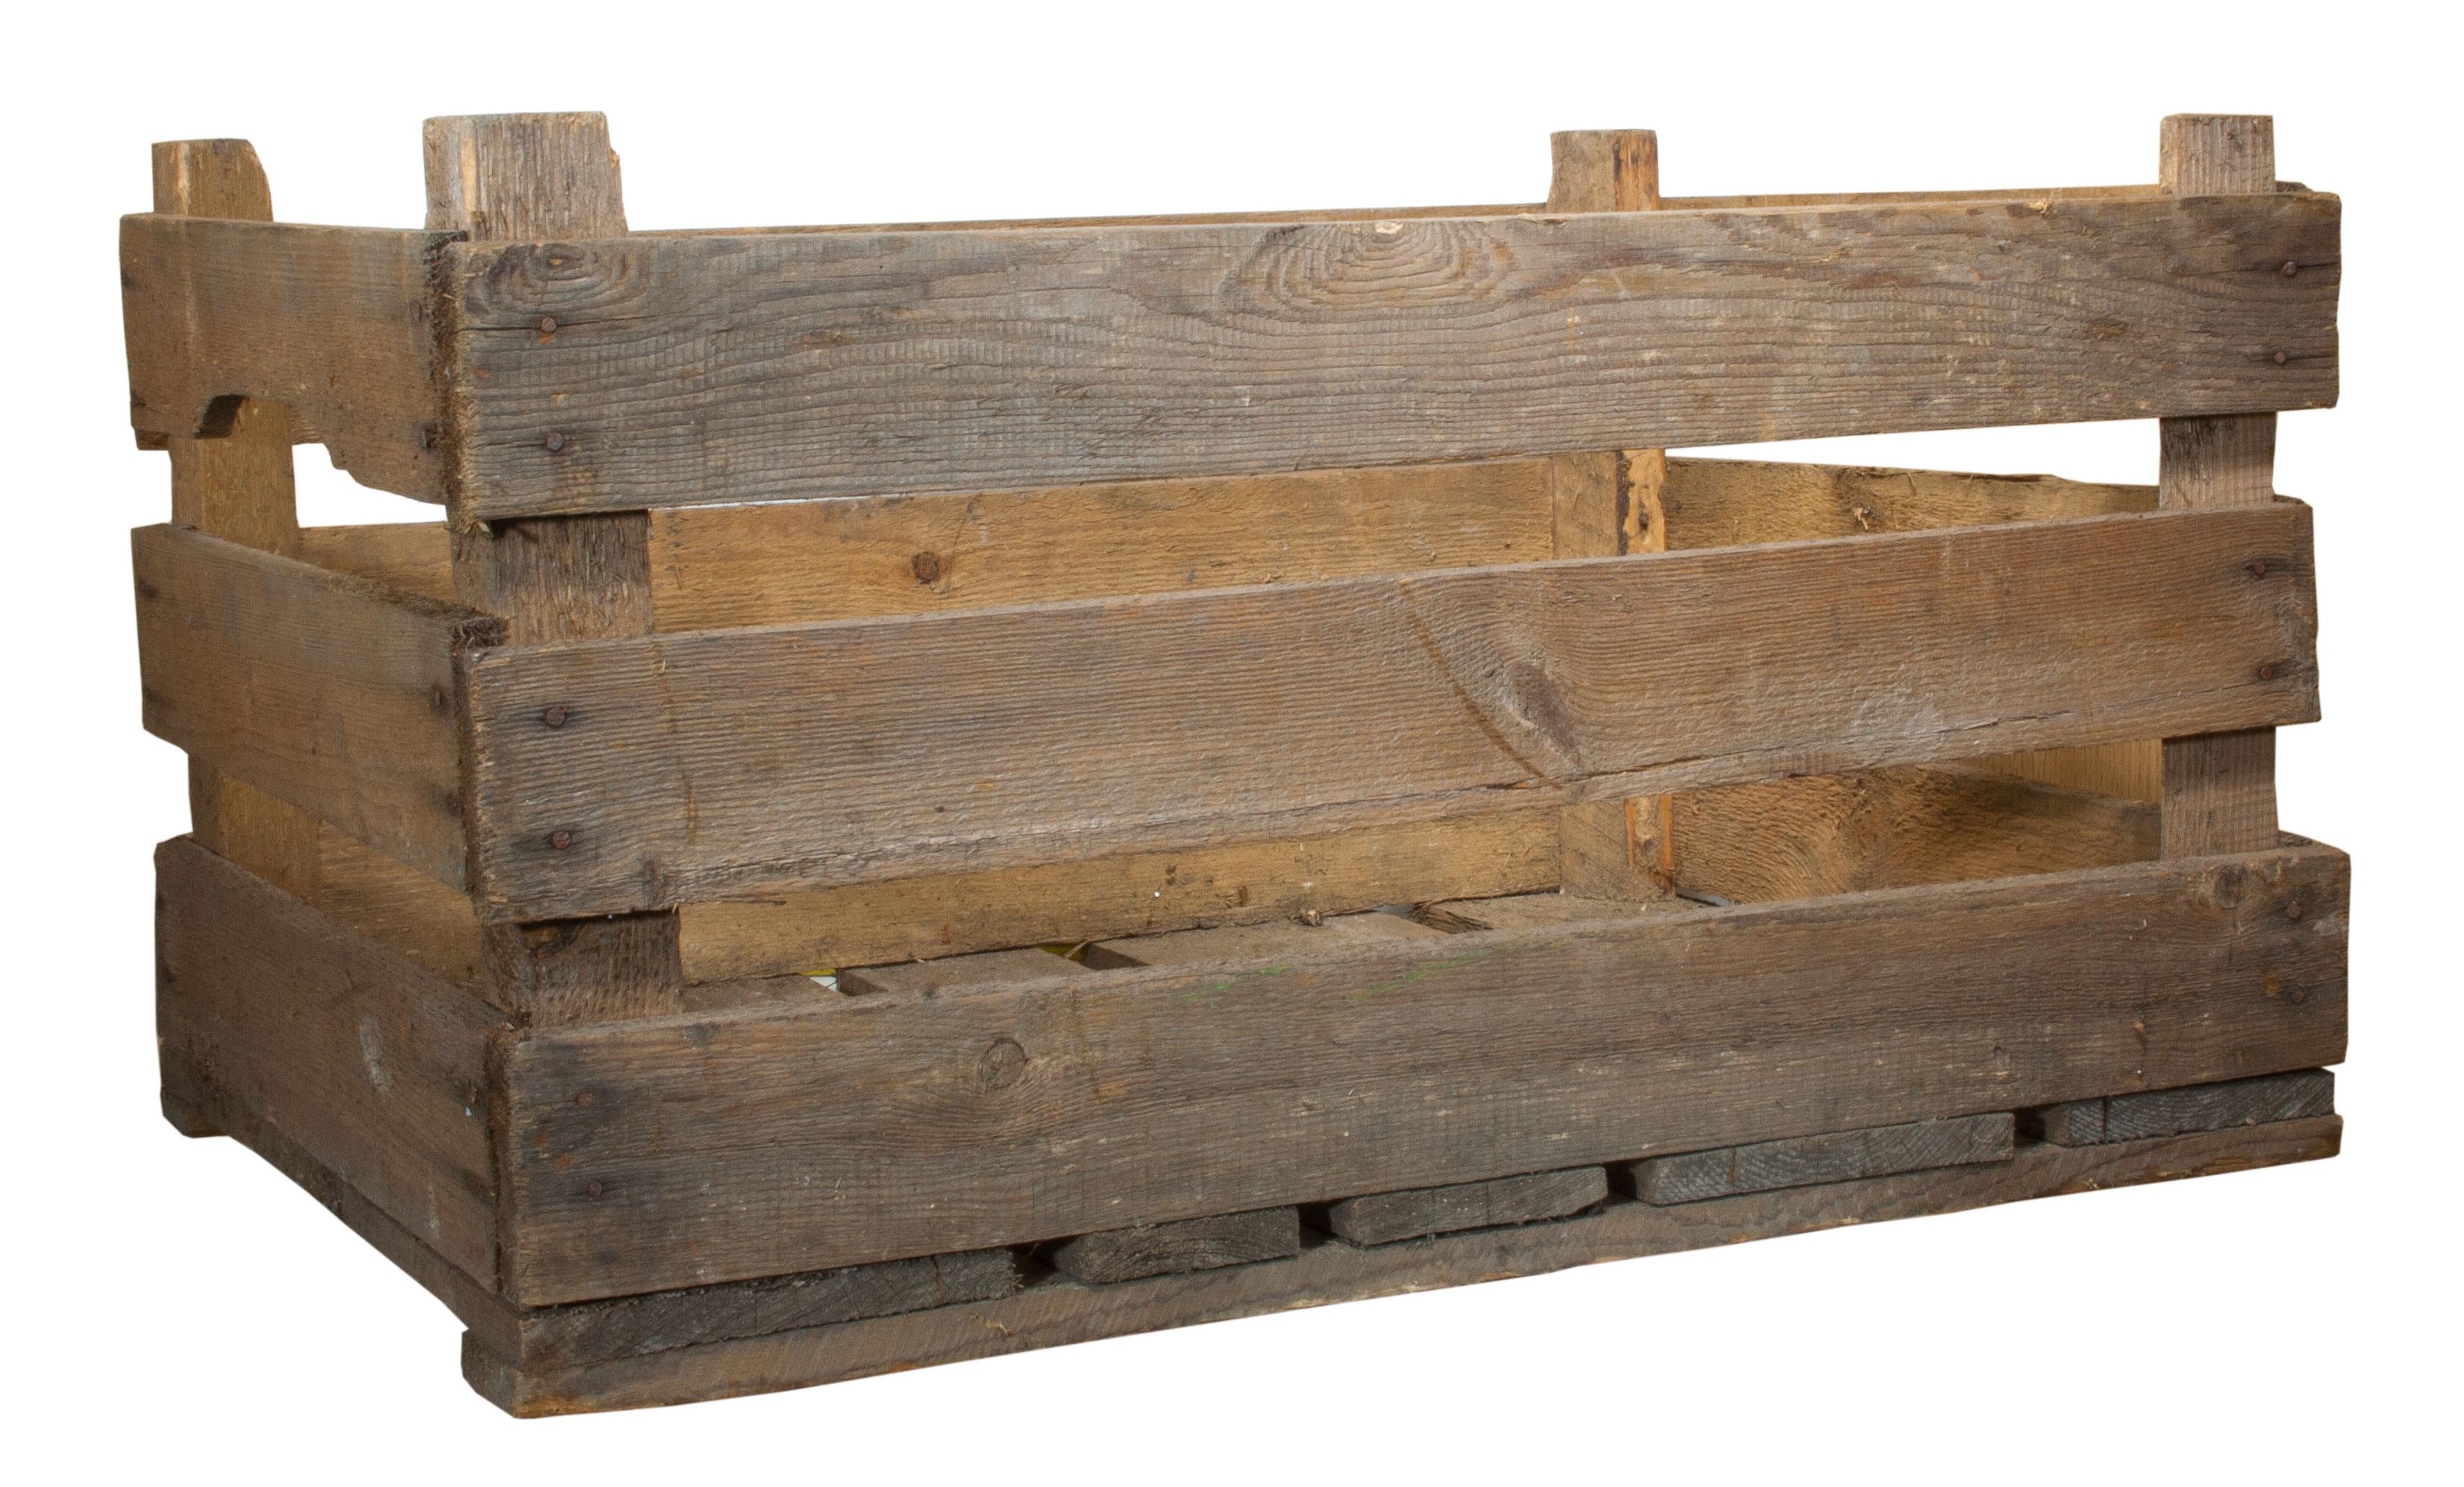 b ware b ware gro e kiste ohne aufdruck 60x39x35cm. Black Bedroom Furniture Sets. Home Design Ideas